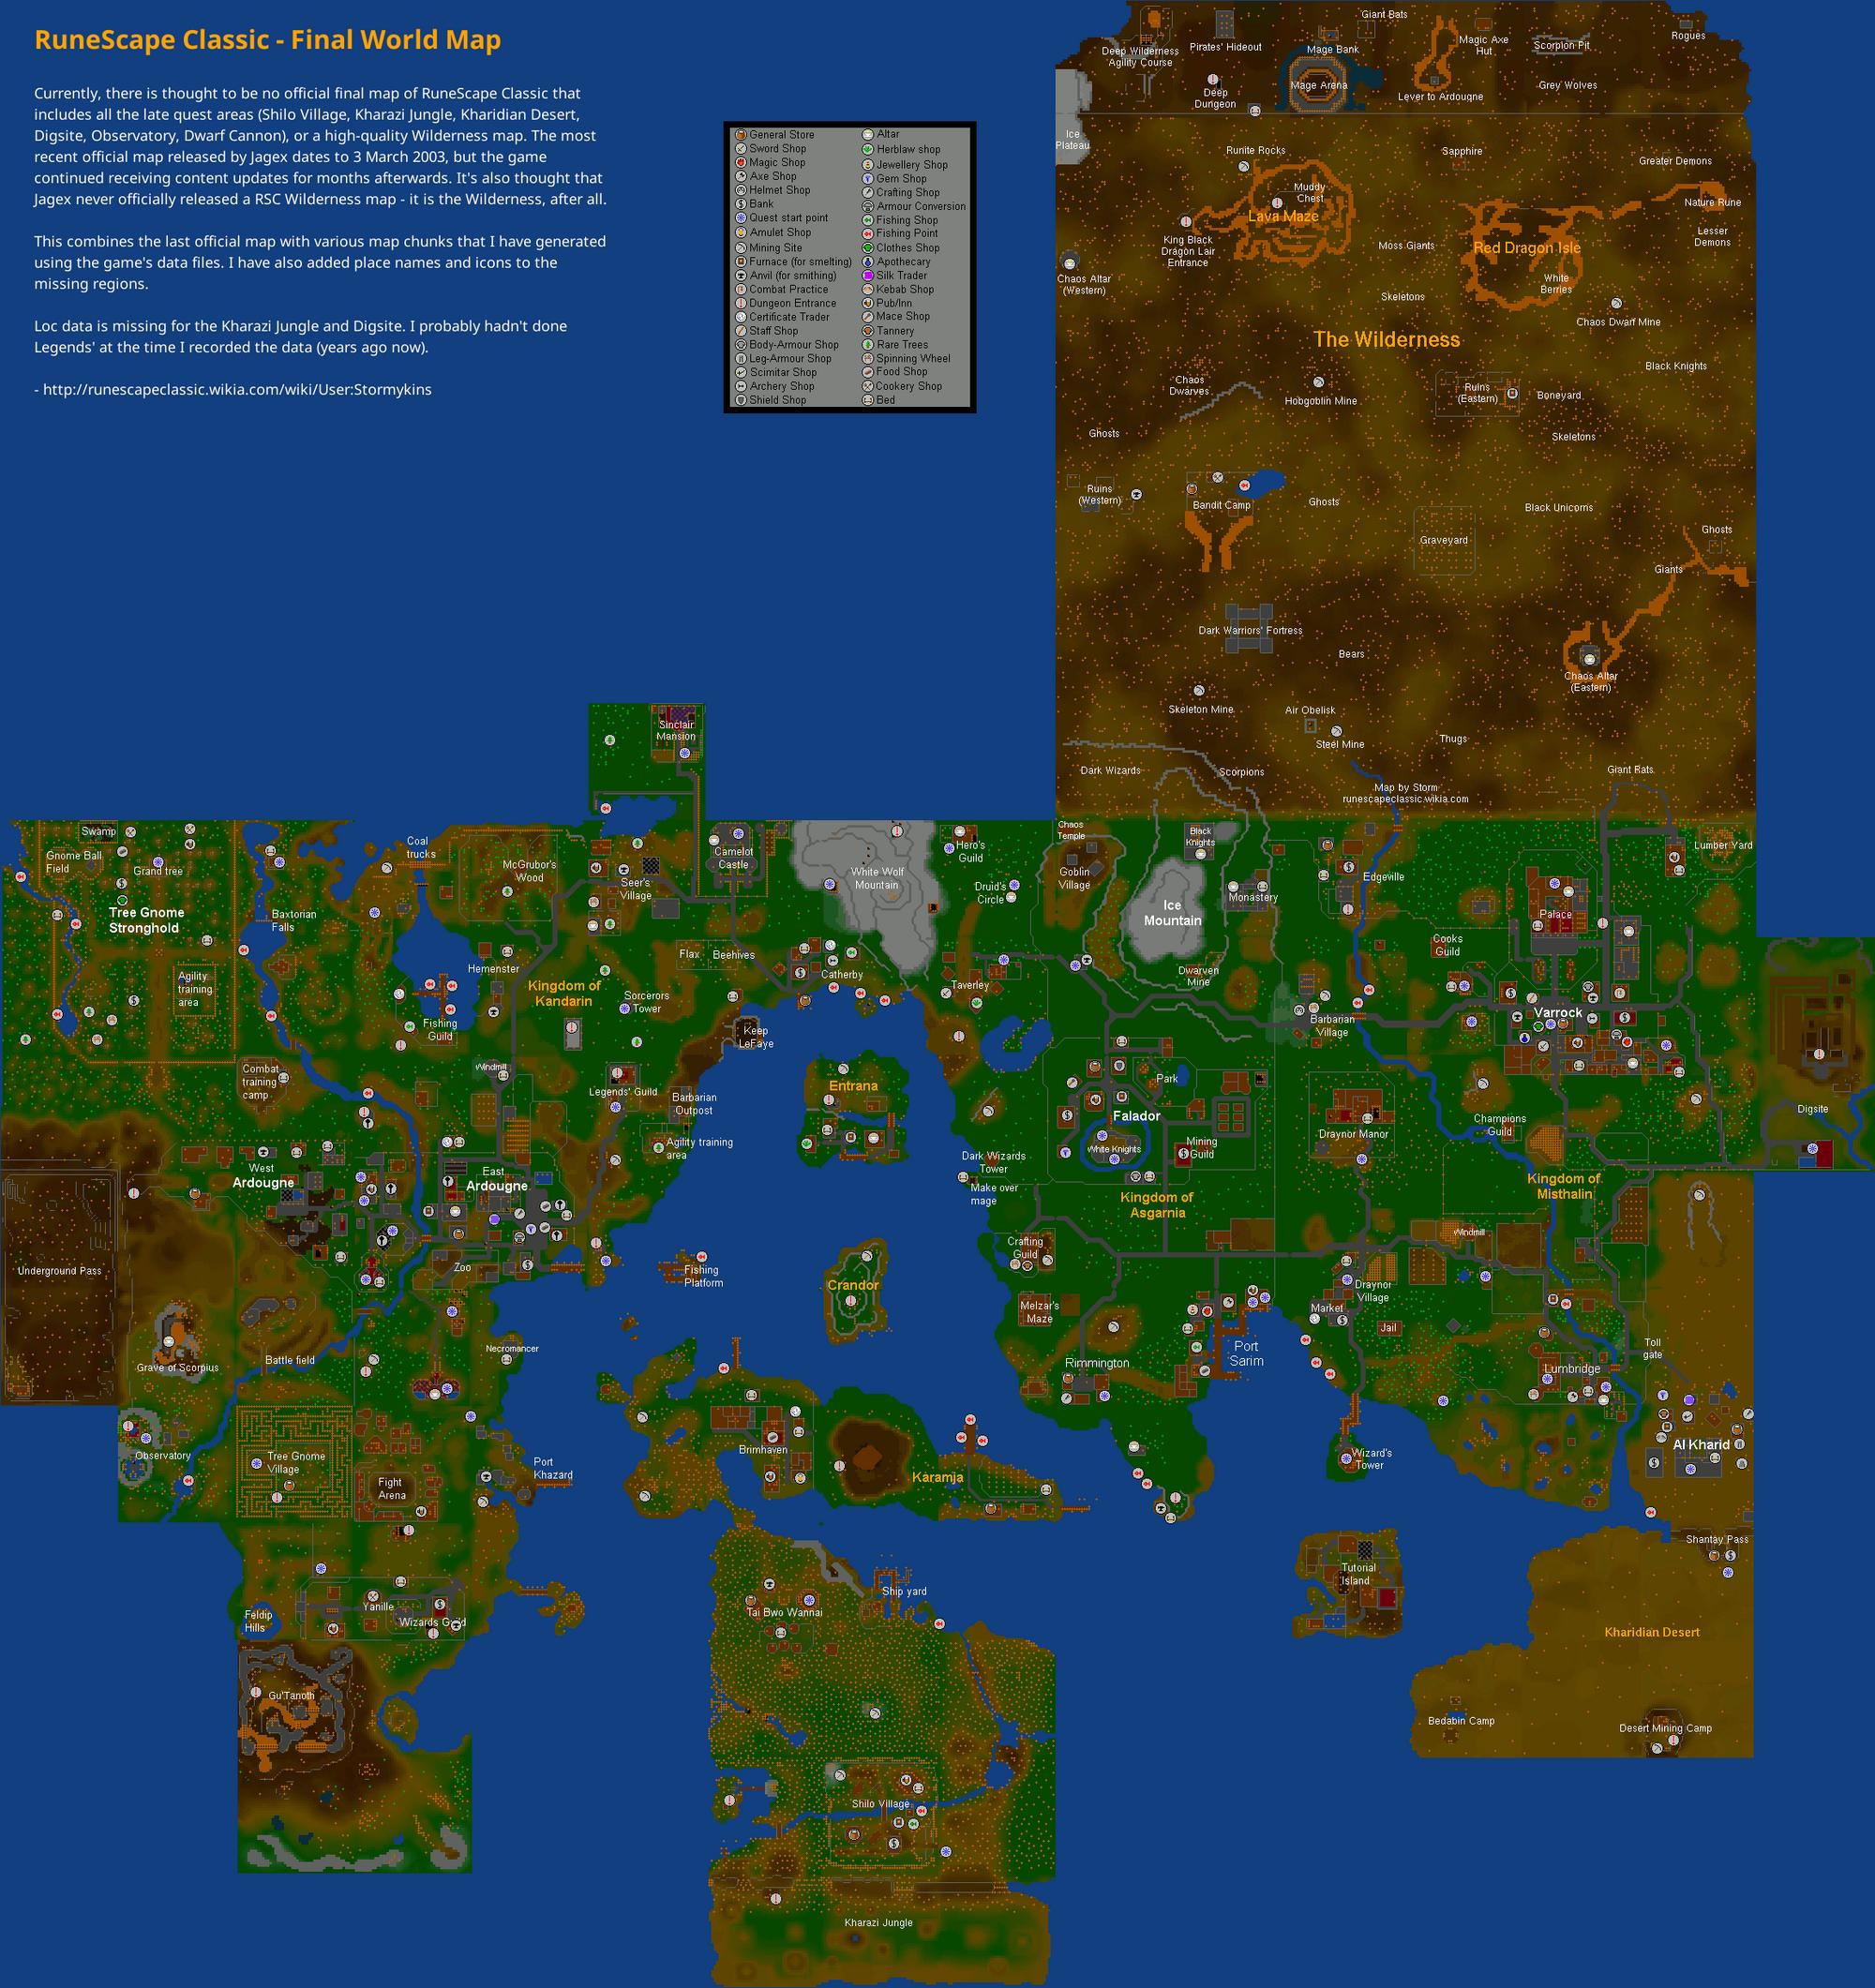 Runescape Classic Map Runescape Classic Wiki Fandom